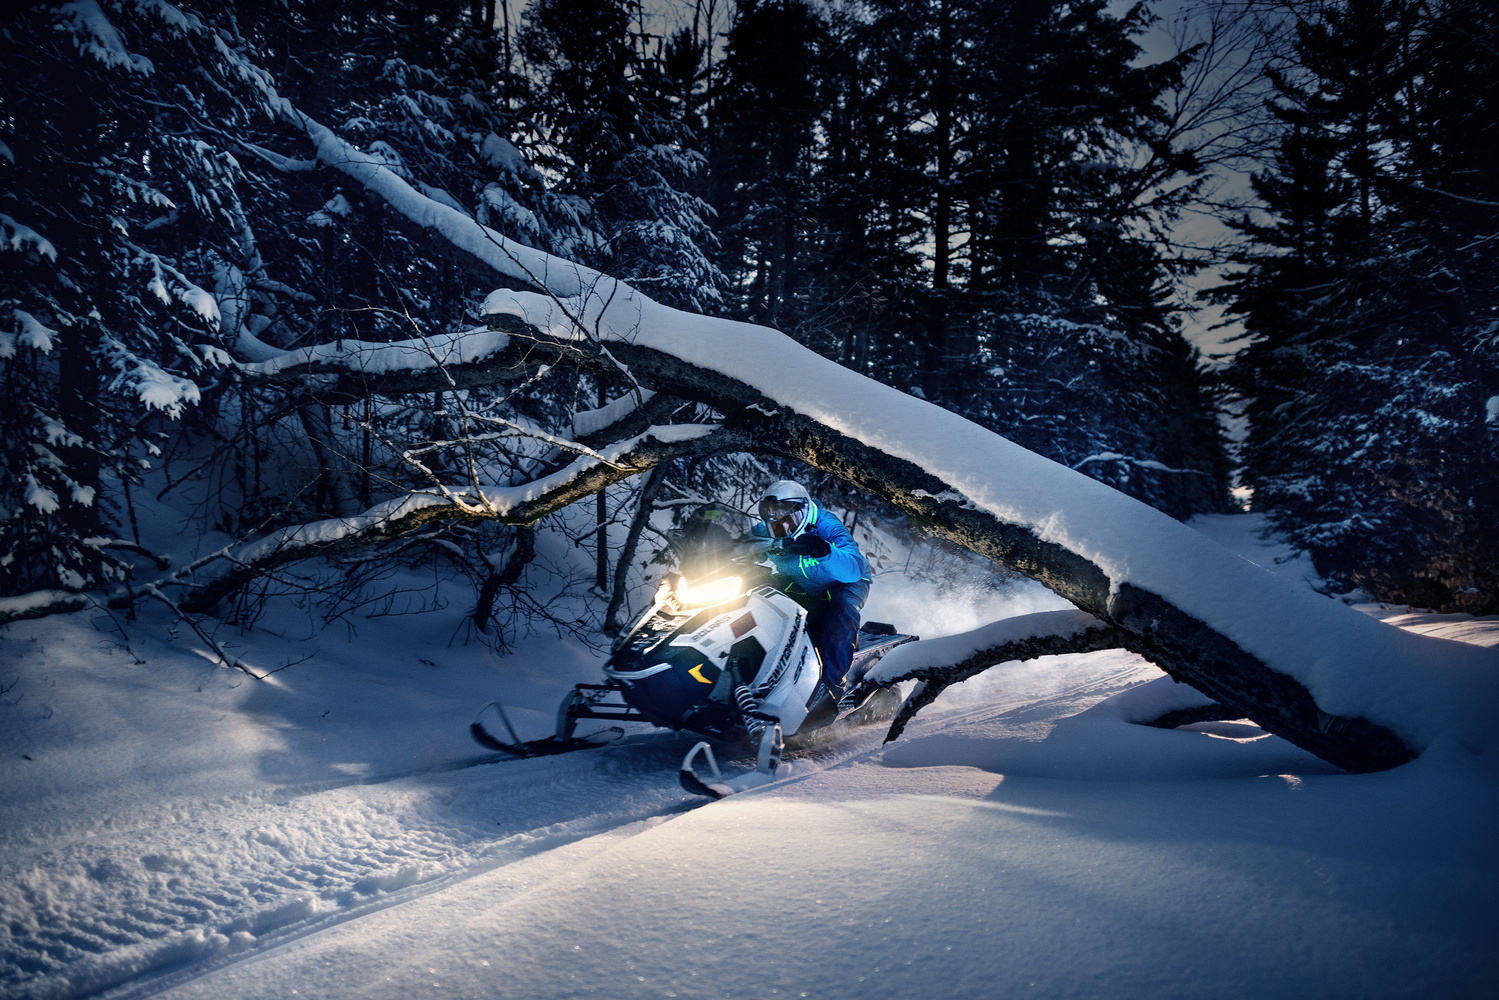 Winter Trail by Marek Dziekonski